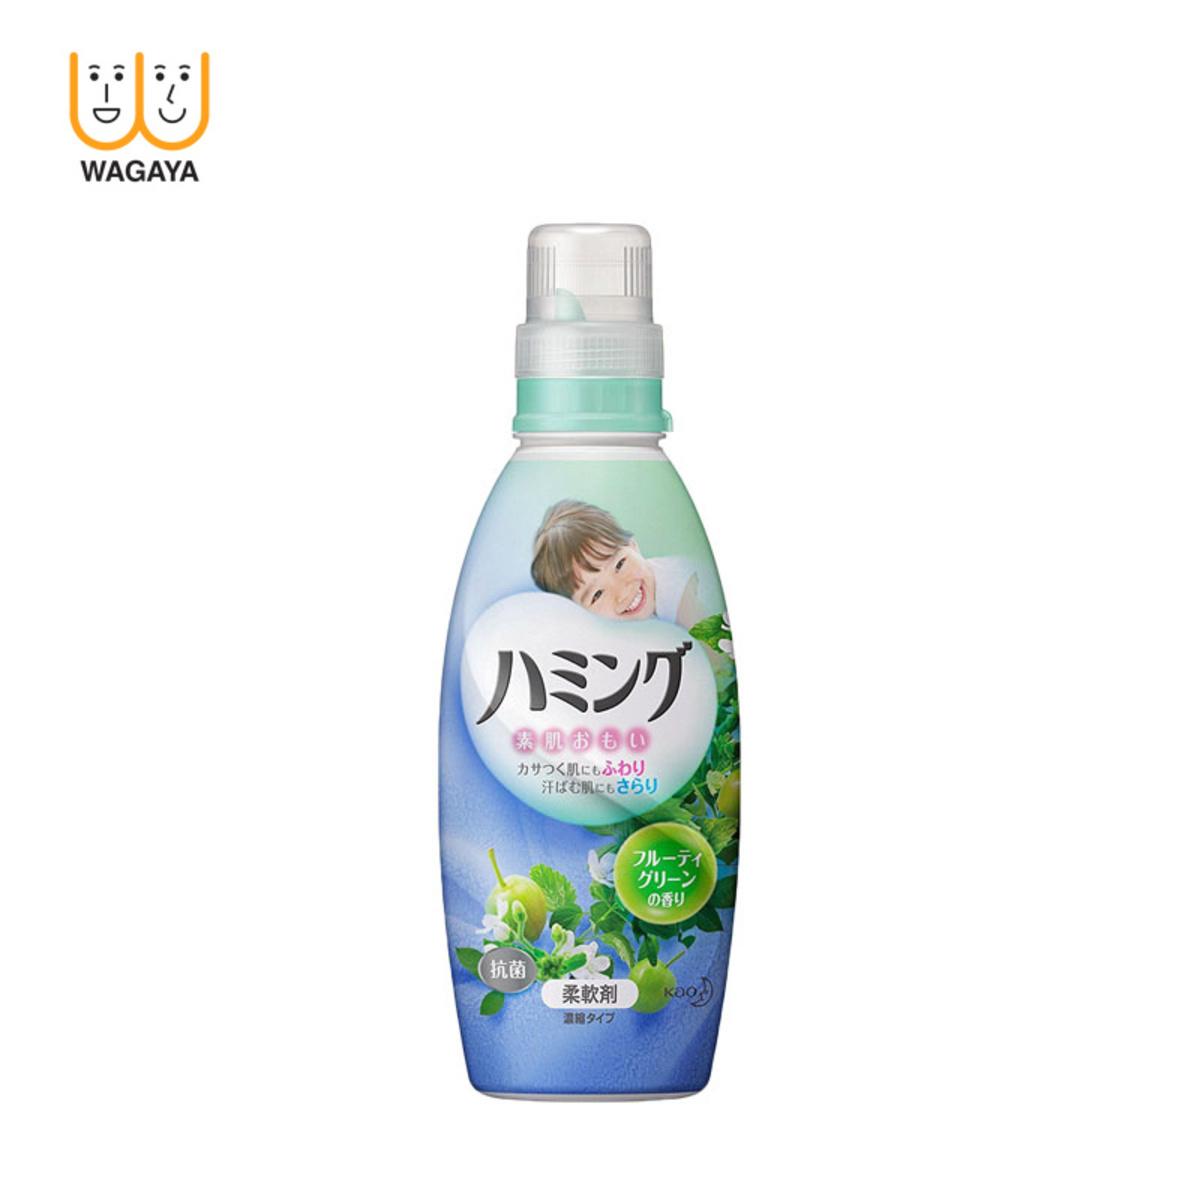 Humming Fragrance Fabric Softener 600ml (Fruity Green - Green)